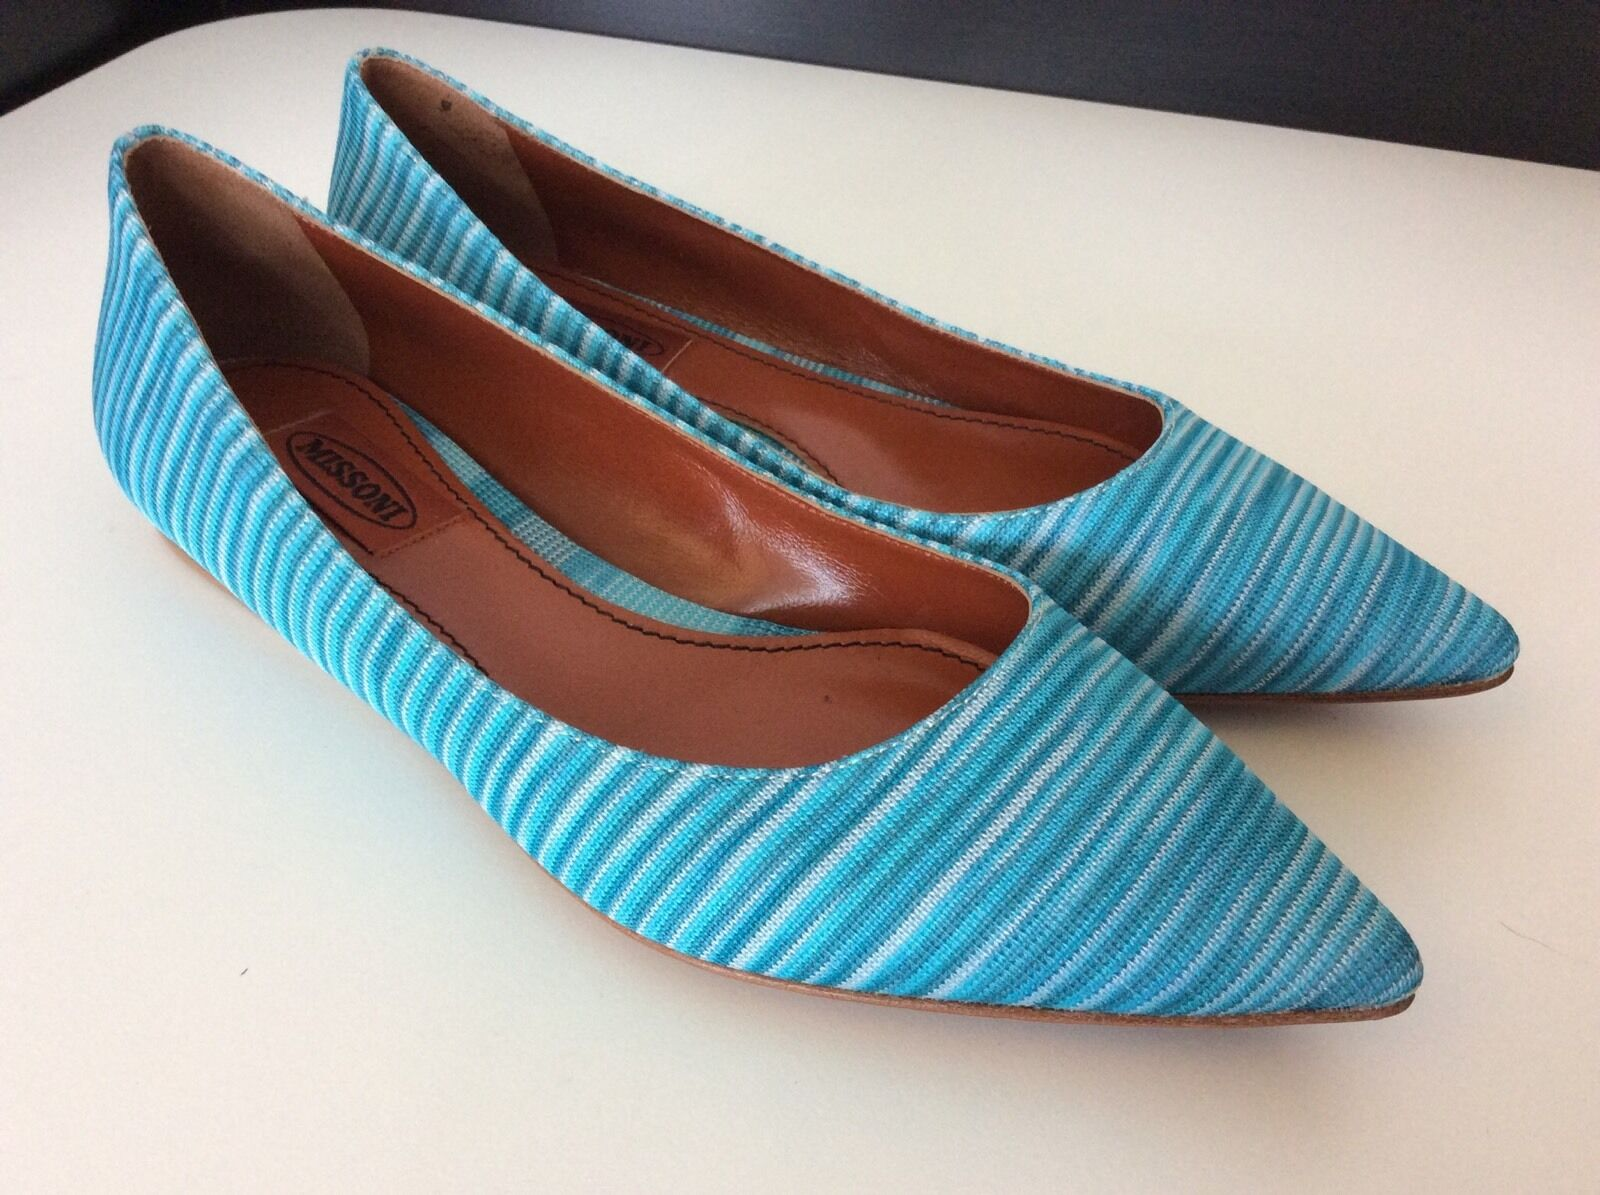 Missoni neuf flats flats flats ballerine chaussures bleu tricot taille 37 Bnwob semelles en cuir f5354a